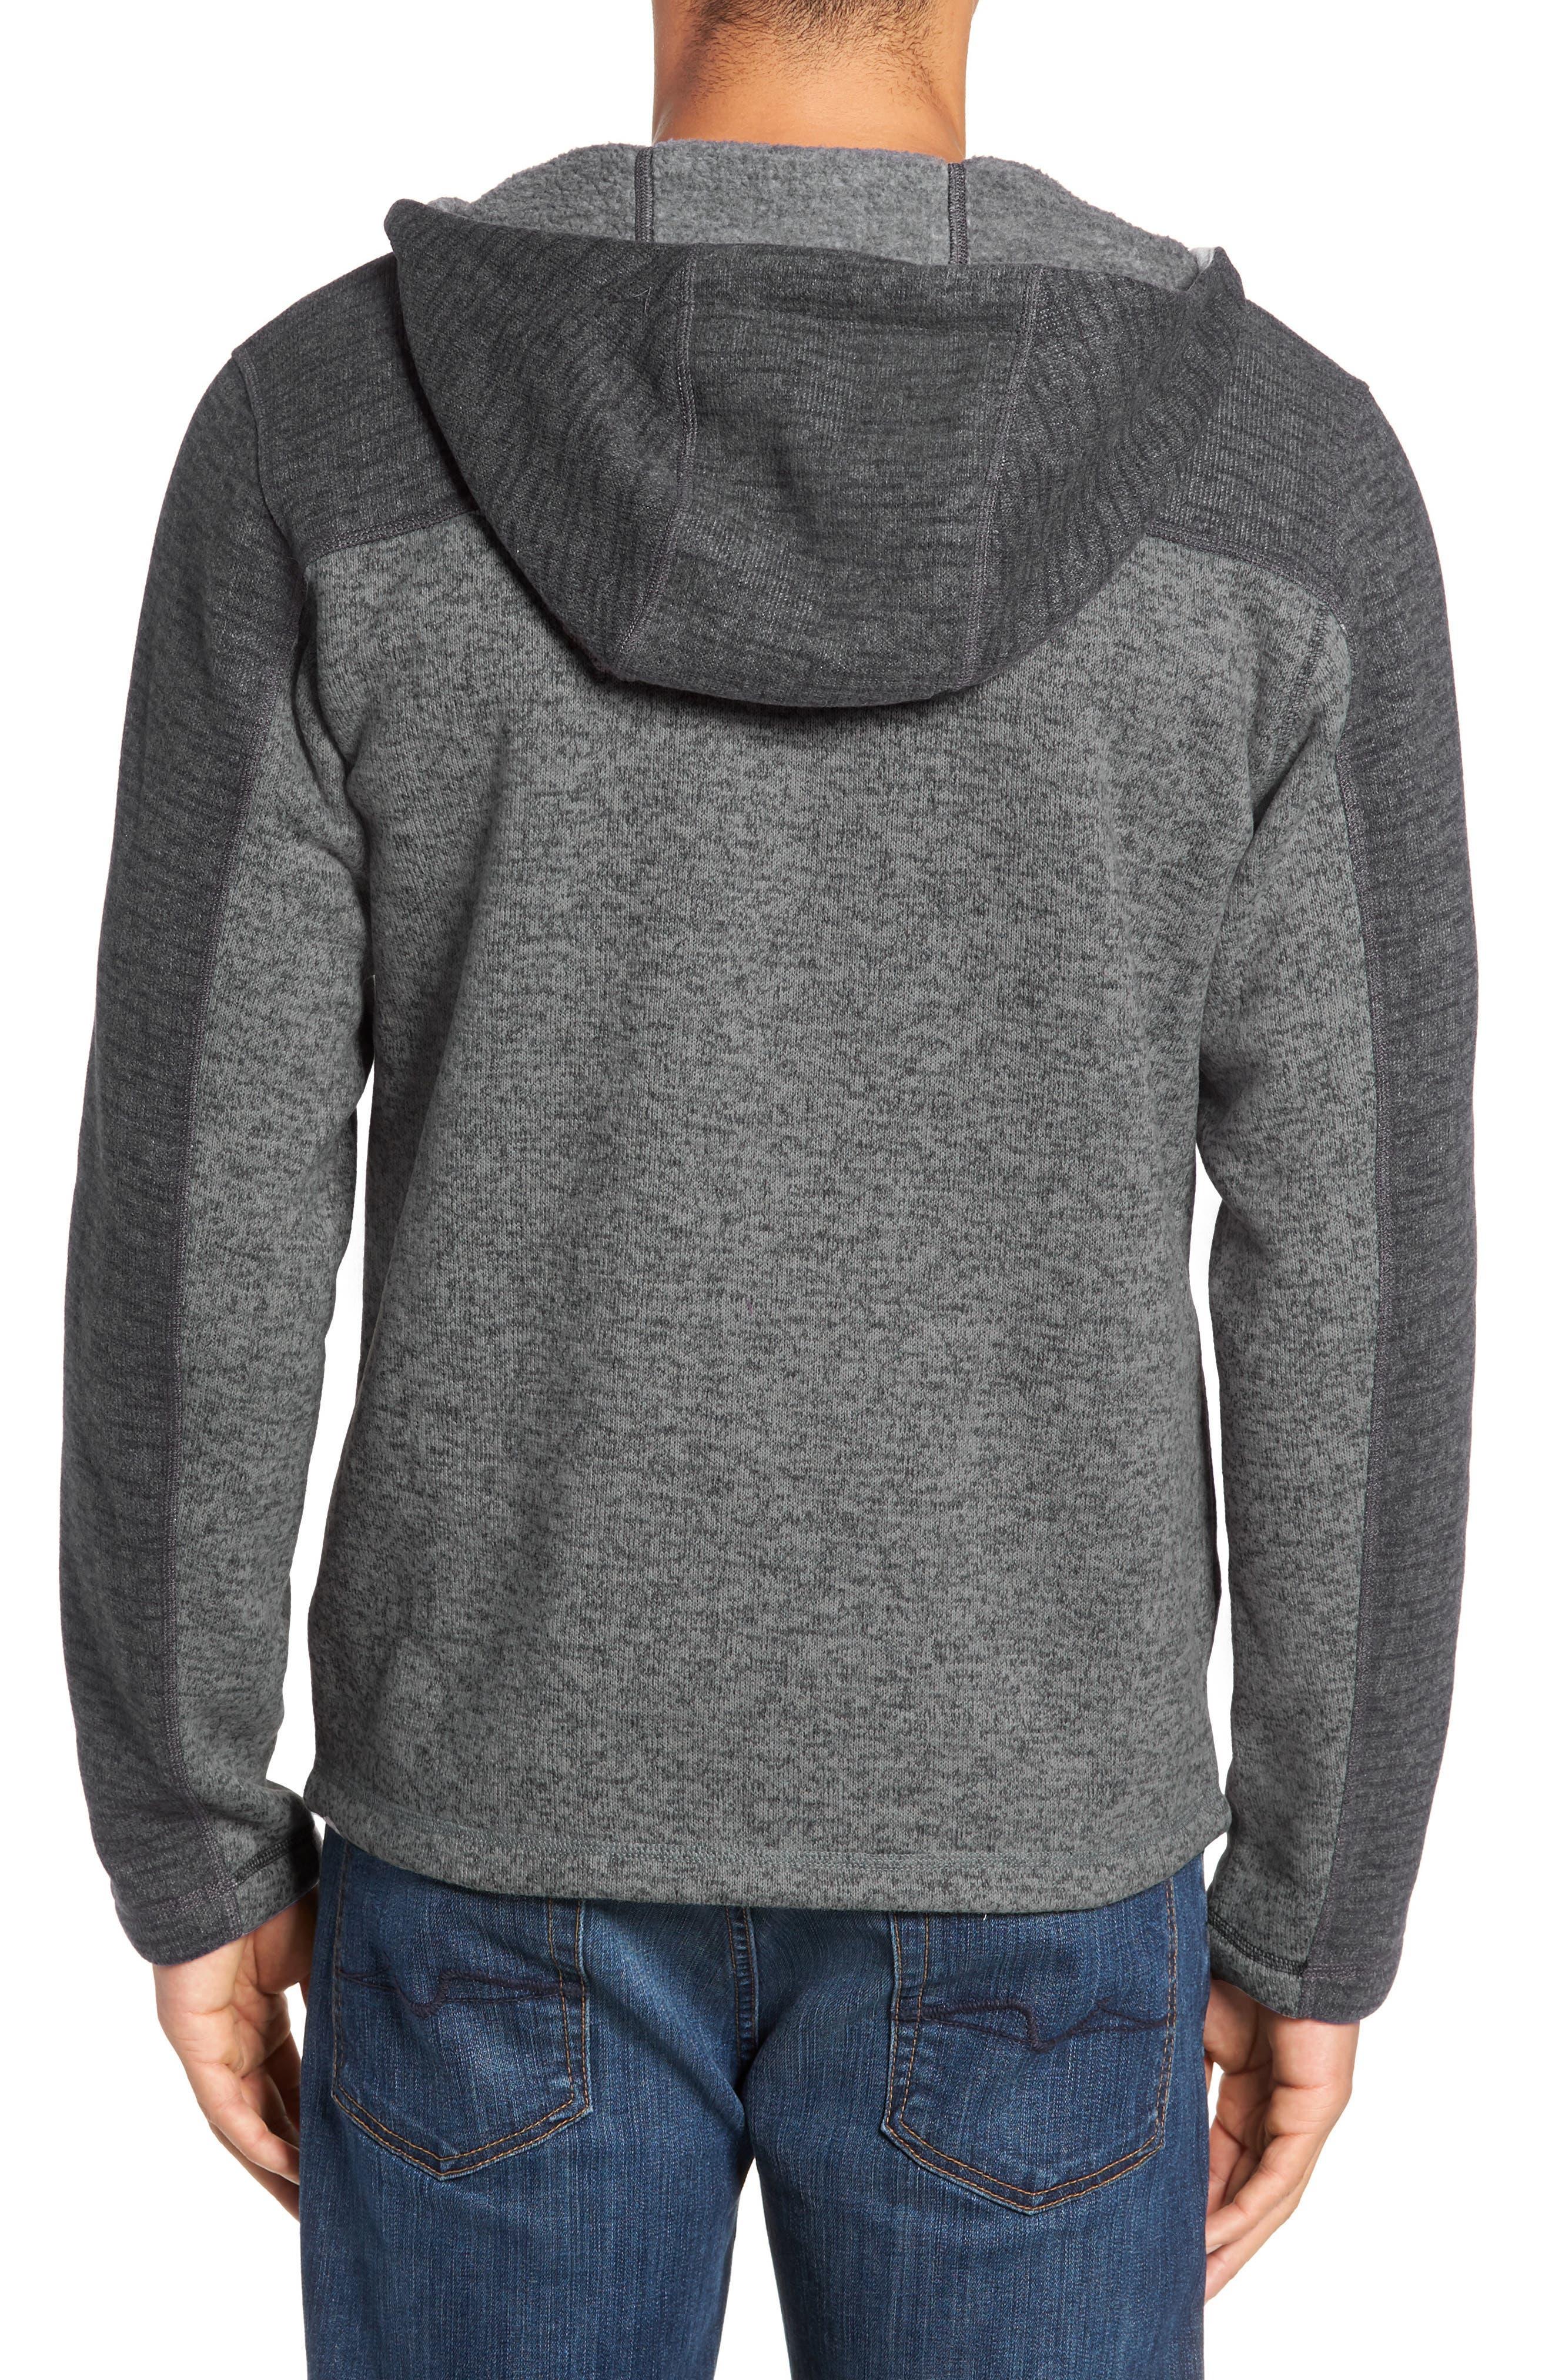 Gordon Lyons Alpine Sweater Fleece Hoodie,                             Alternate thumbnail 2, color,                             ASPHALT GREY/ MONUMENT GREY